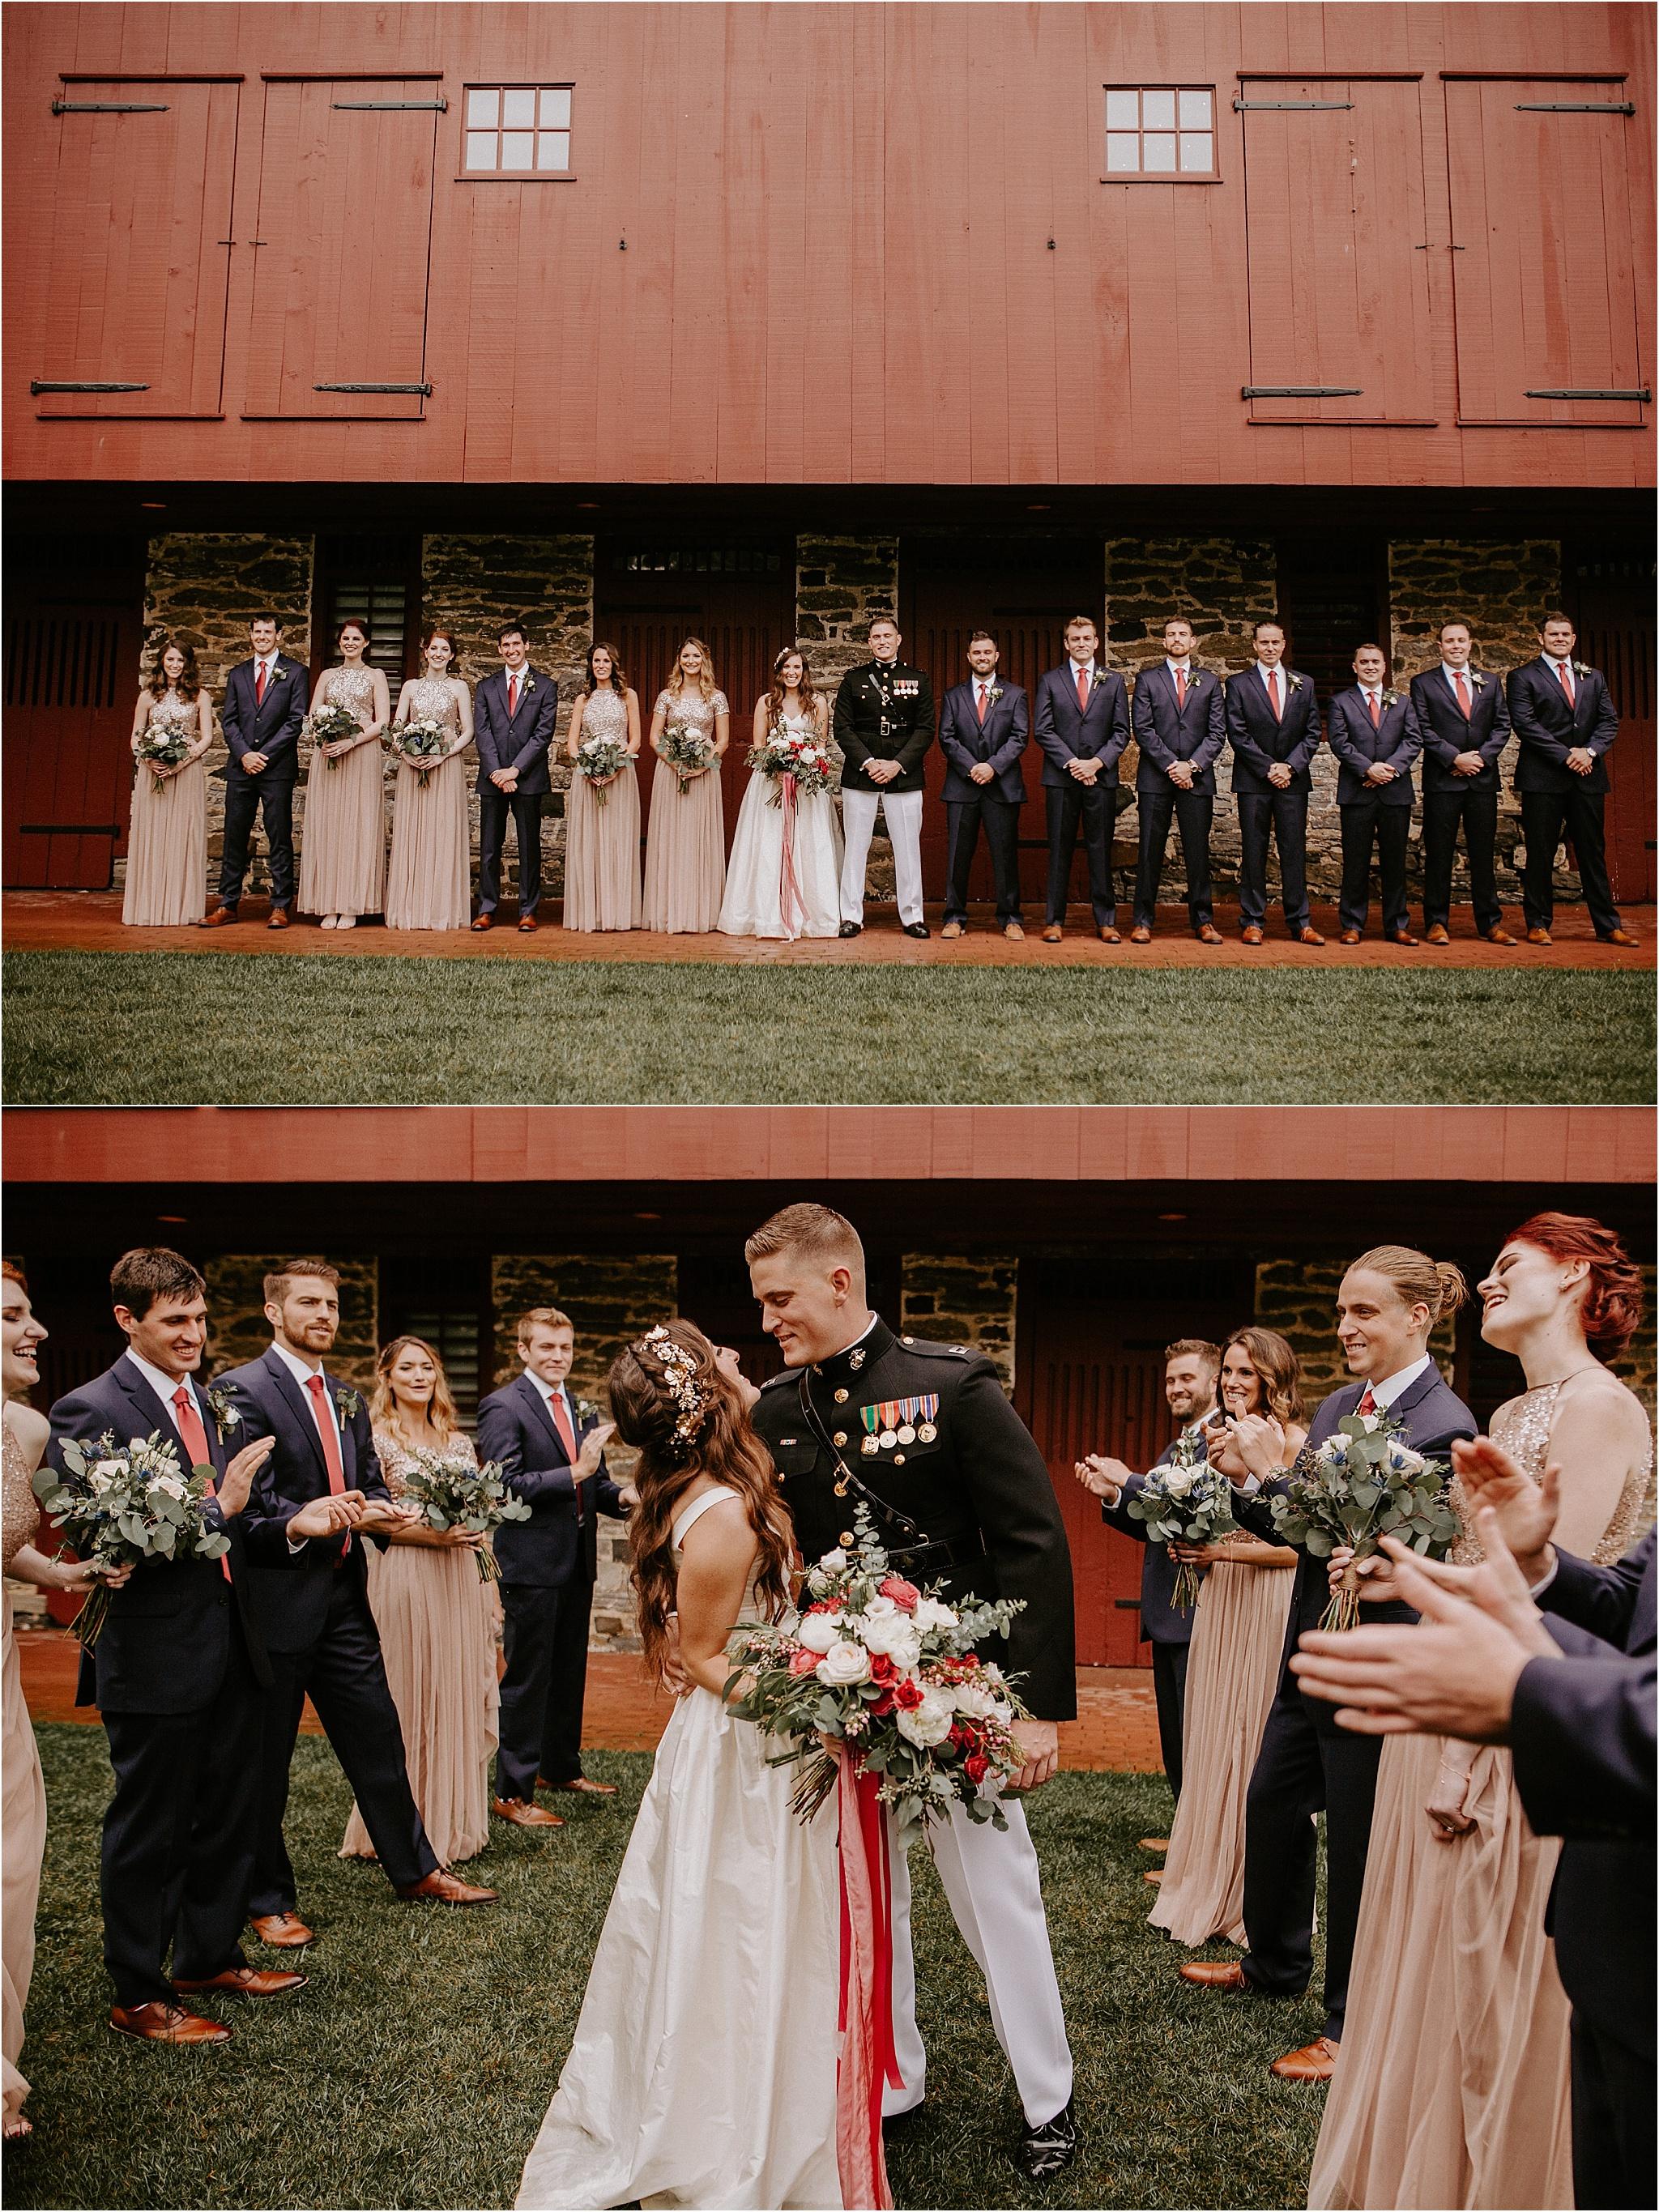 Sarah_Brookhart_Farm_at_Eagles_Ridge_Wedding_Photographer_0033.jpg